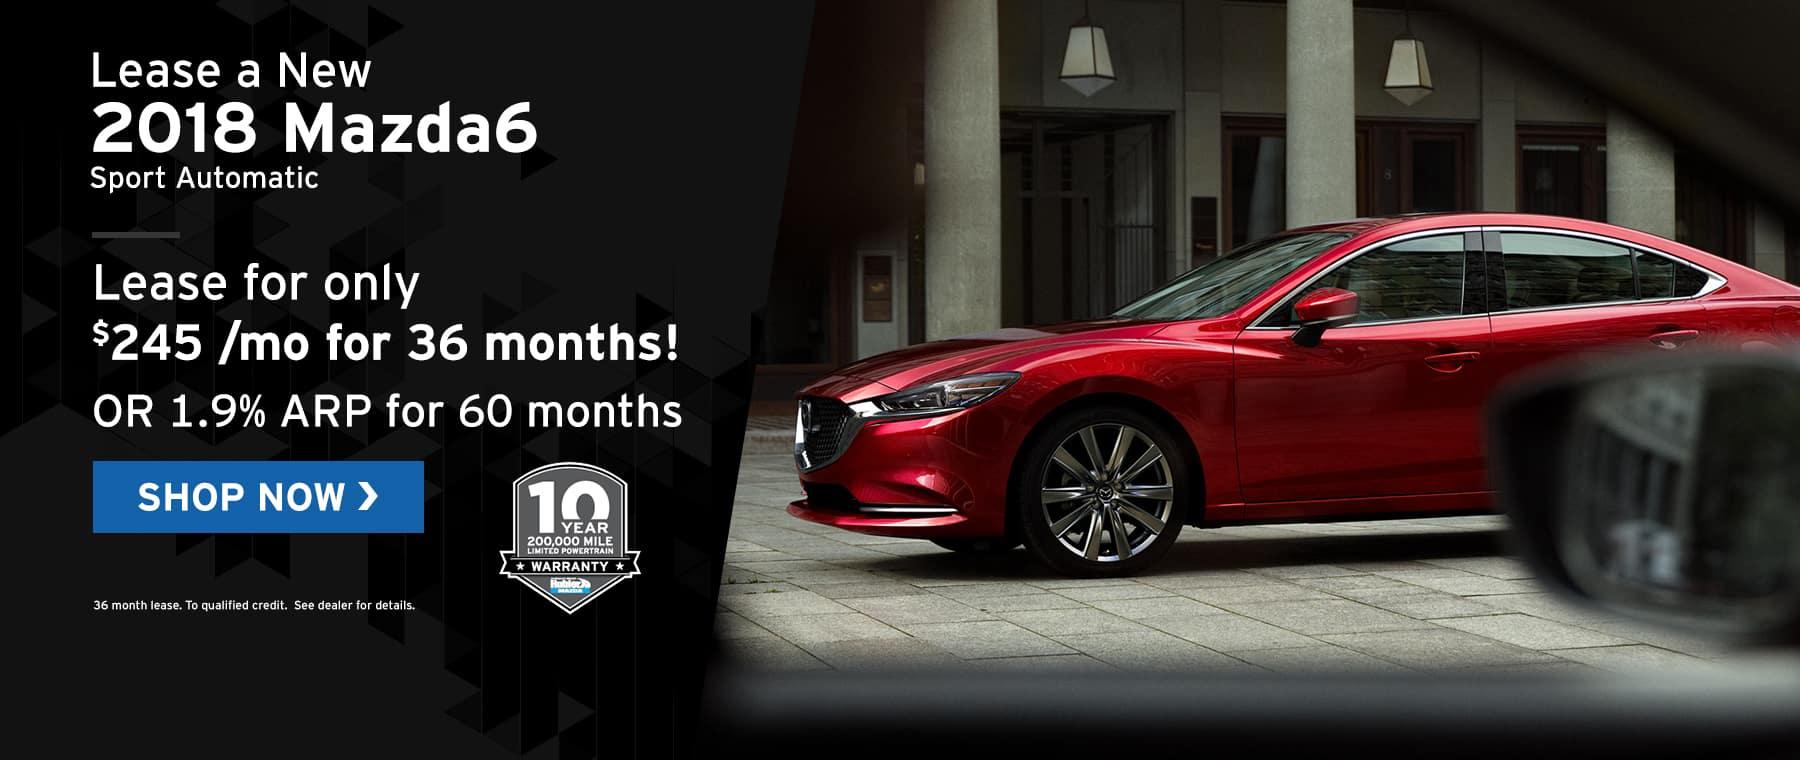 Mazda6 specials at Hubler Mazda